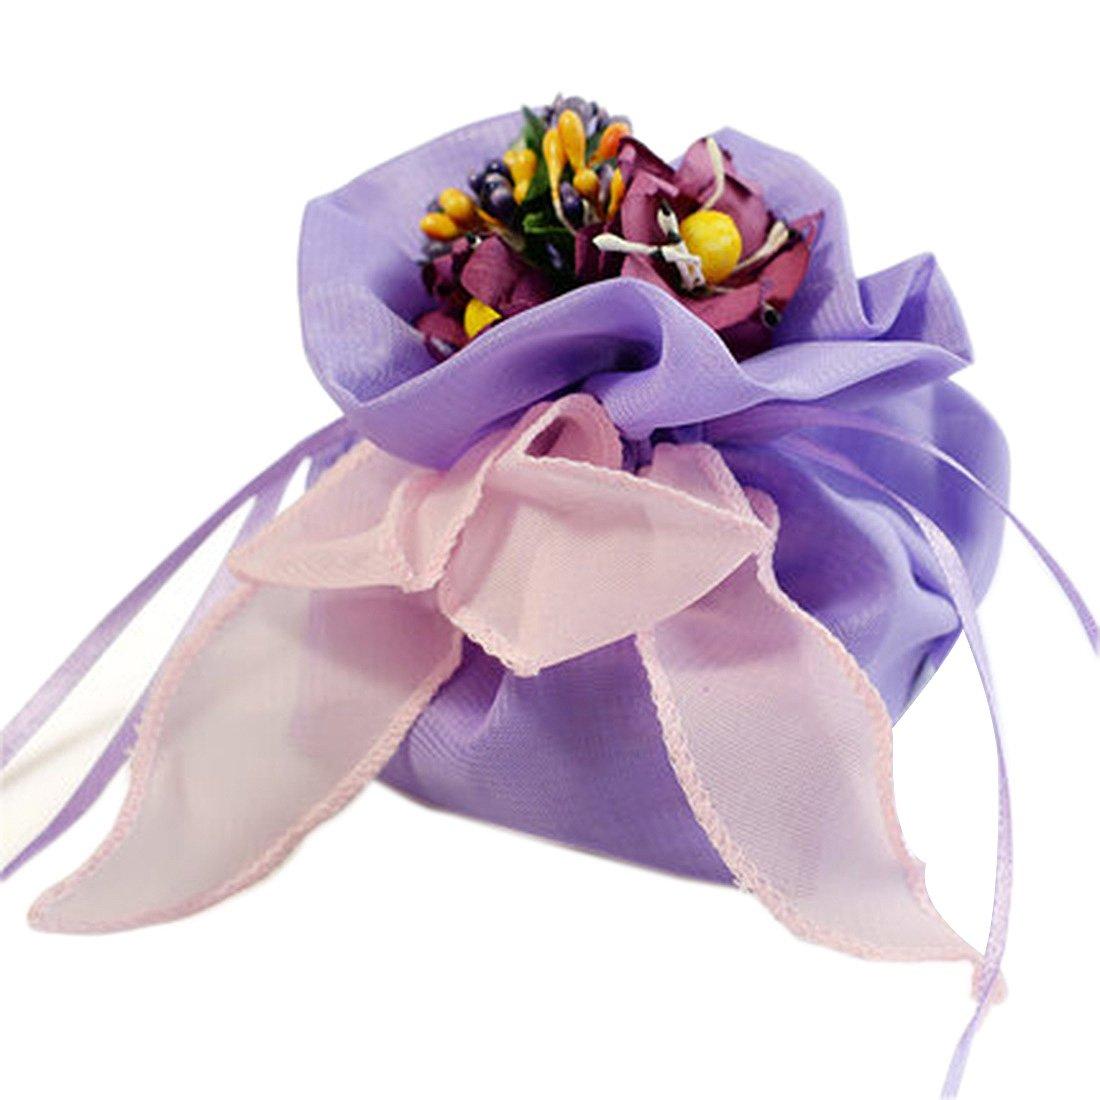 autulet Kids Party Bags Unique Purple Wedding Favors Party Favor Ideas Organza Gift Bags High-End Gifts 10Pieces